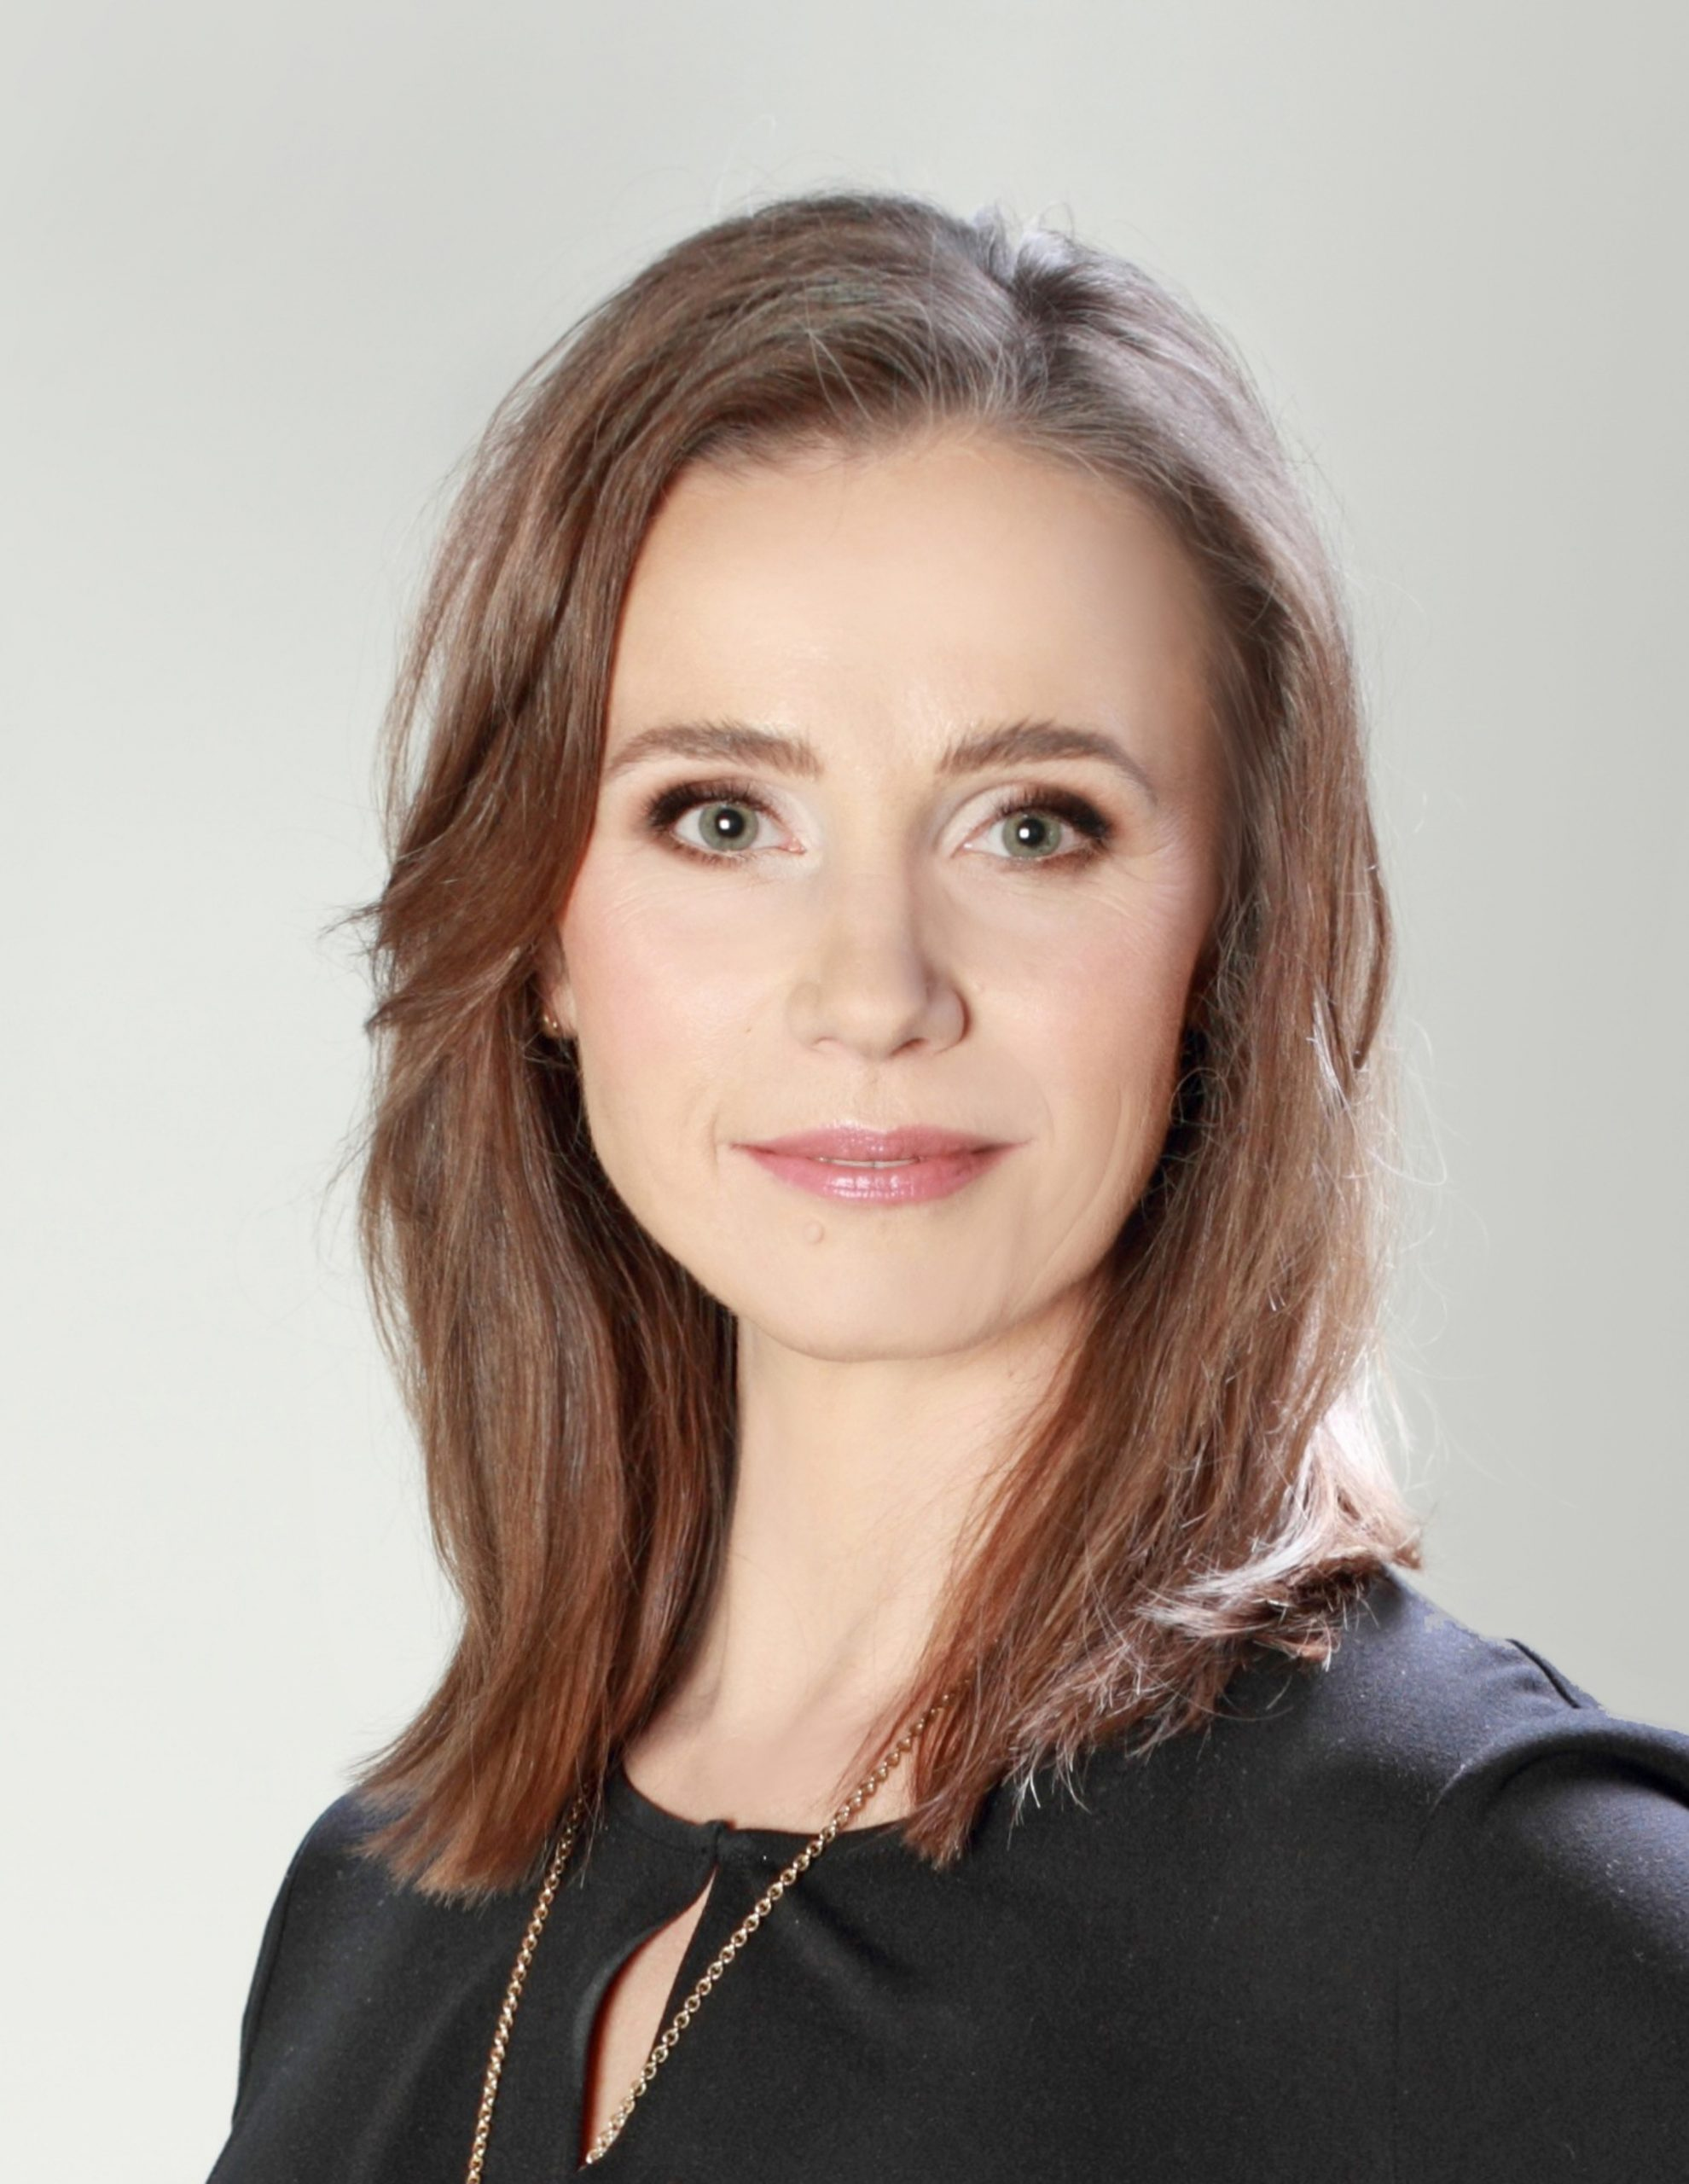 Anna Smagow